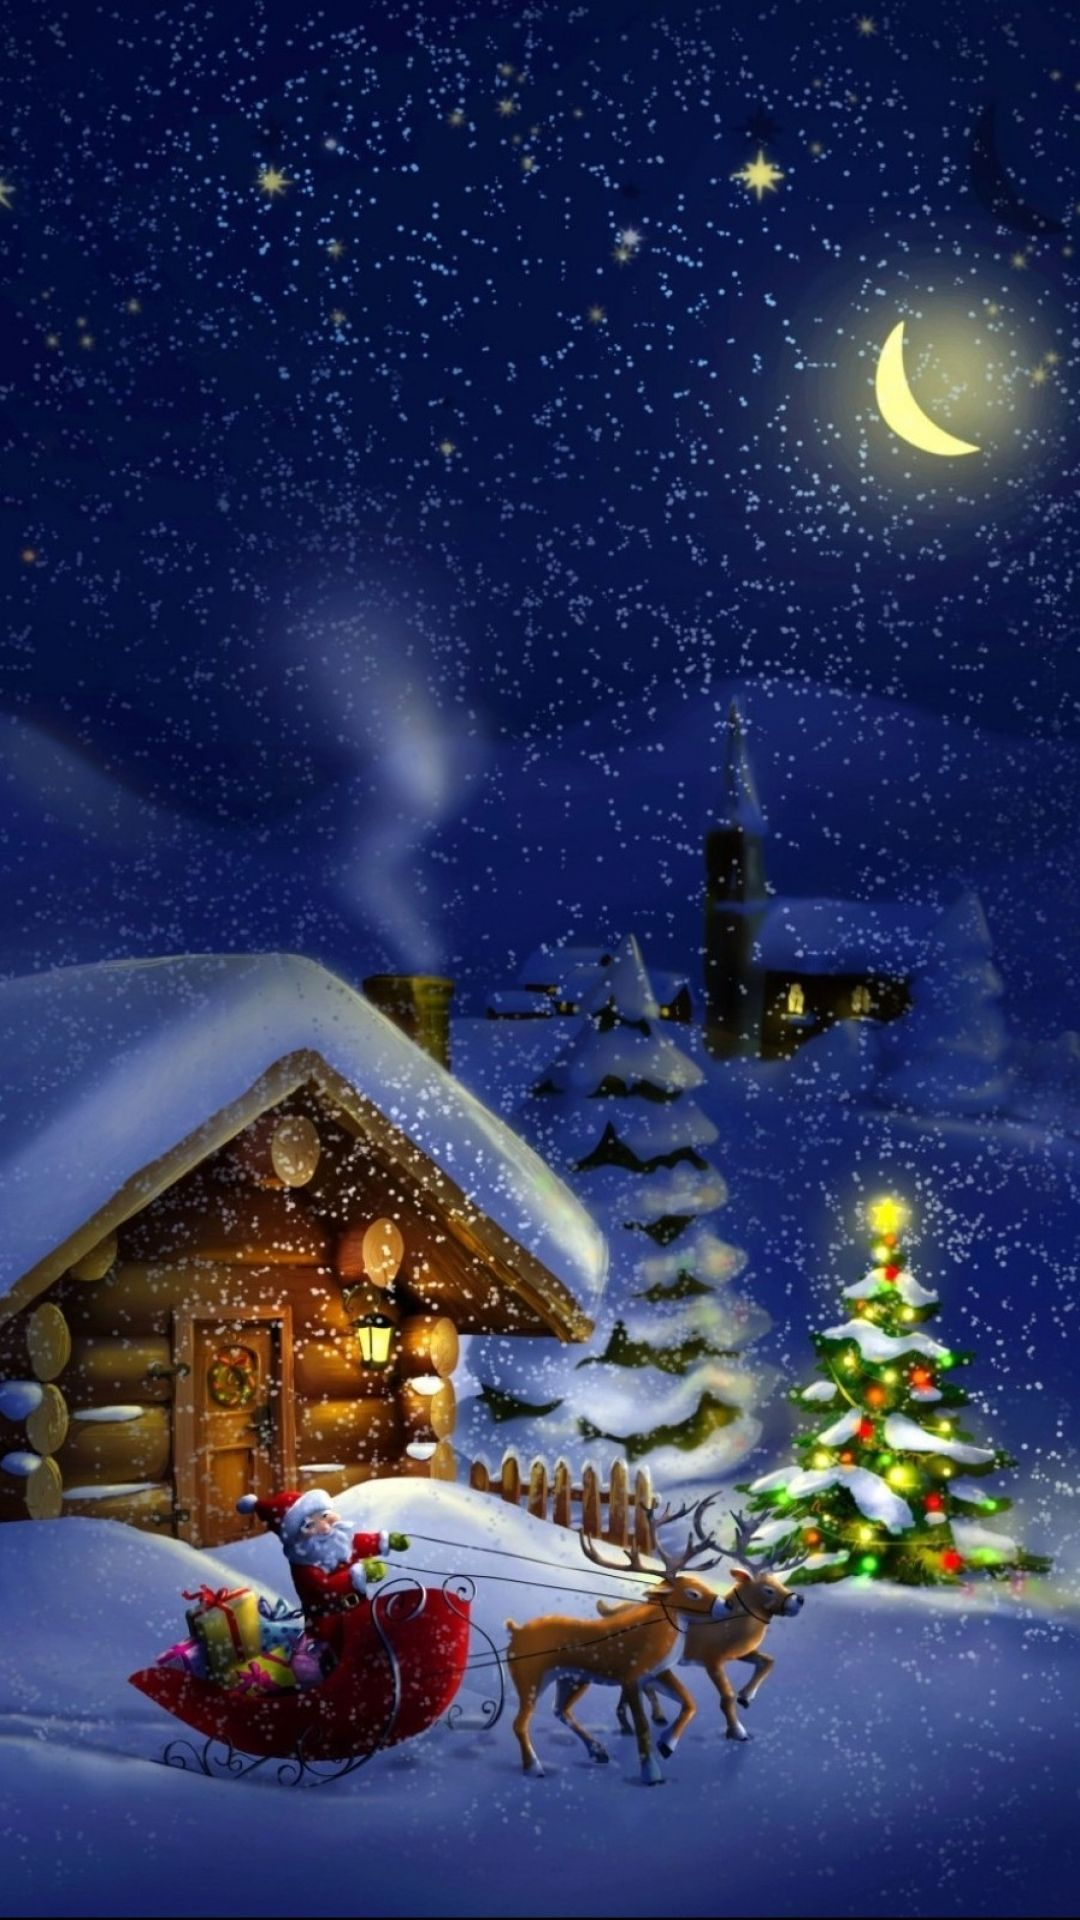 Hd wallpaper christmas